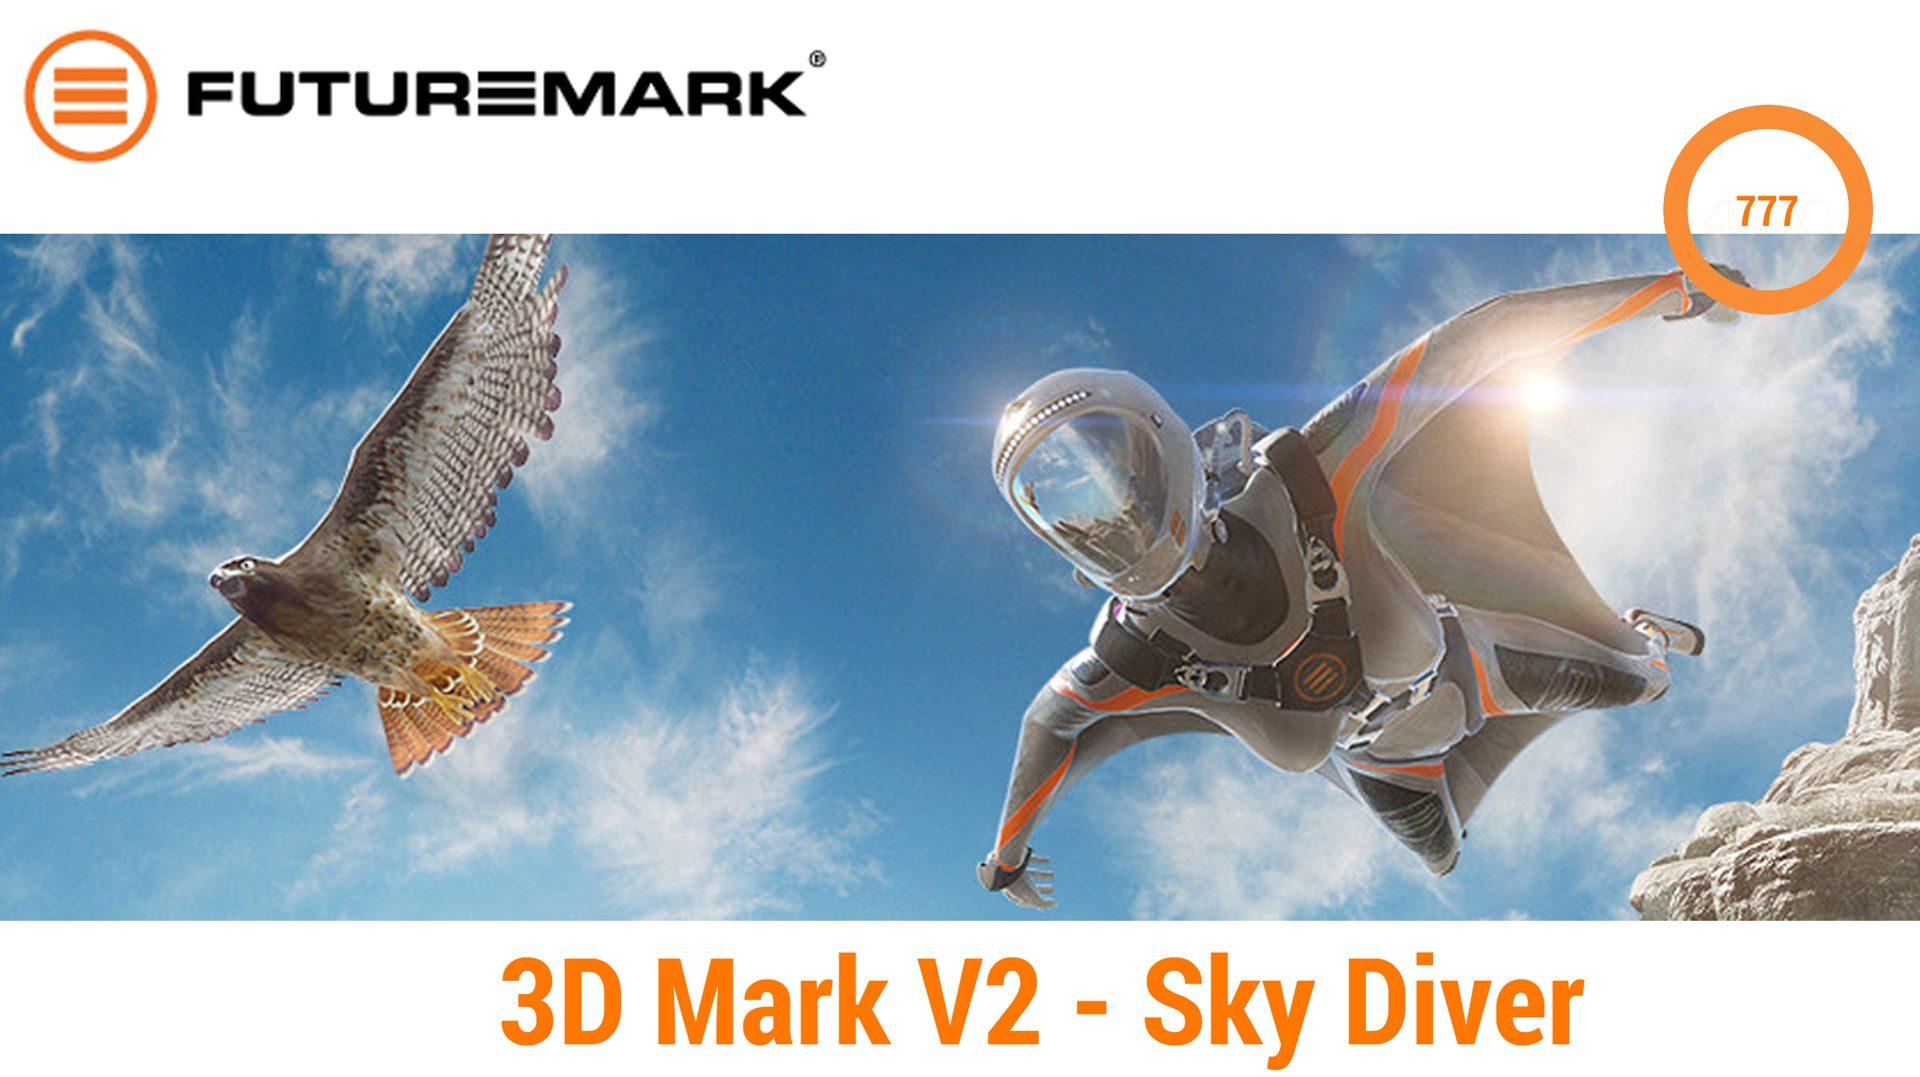 Verico-Unipad-10—Benchmark-3D-Mark-Sky-Diver